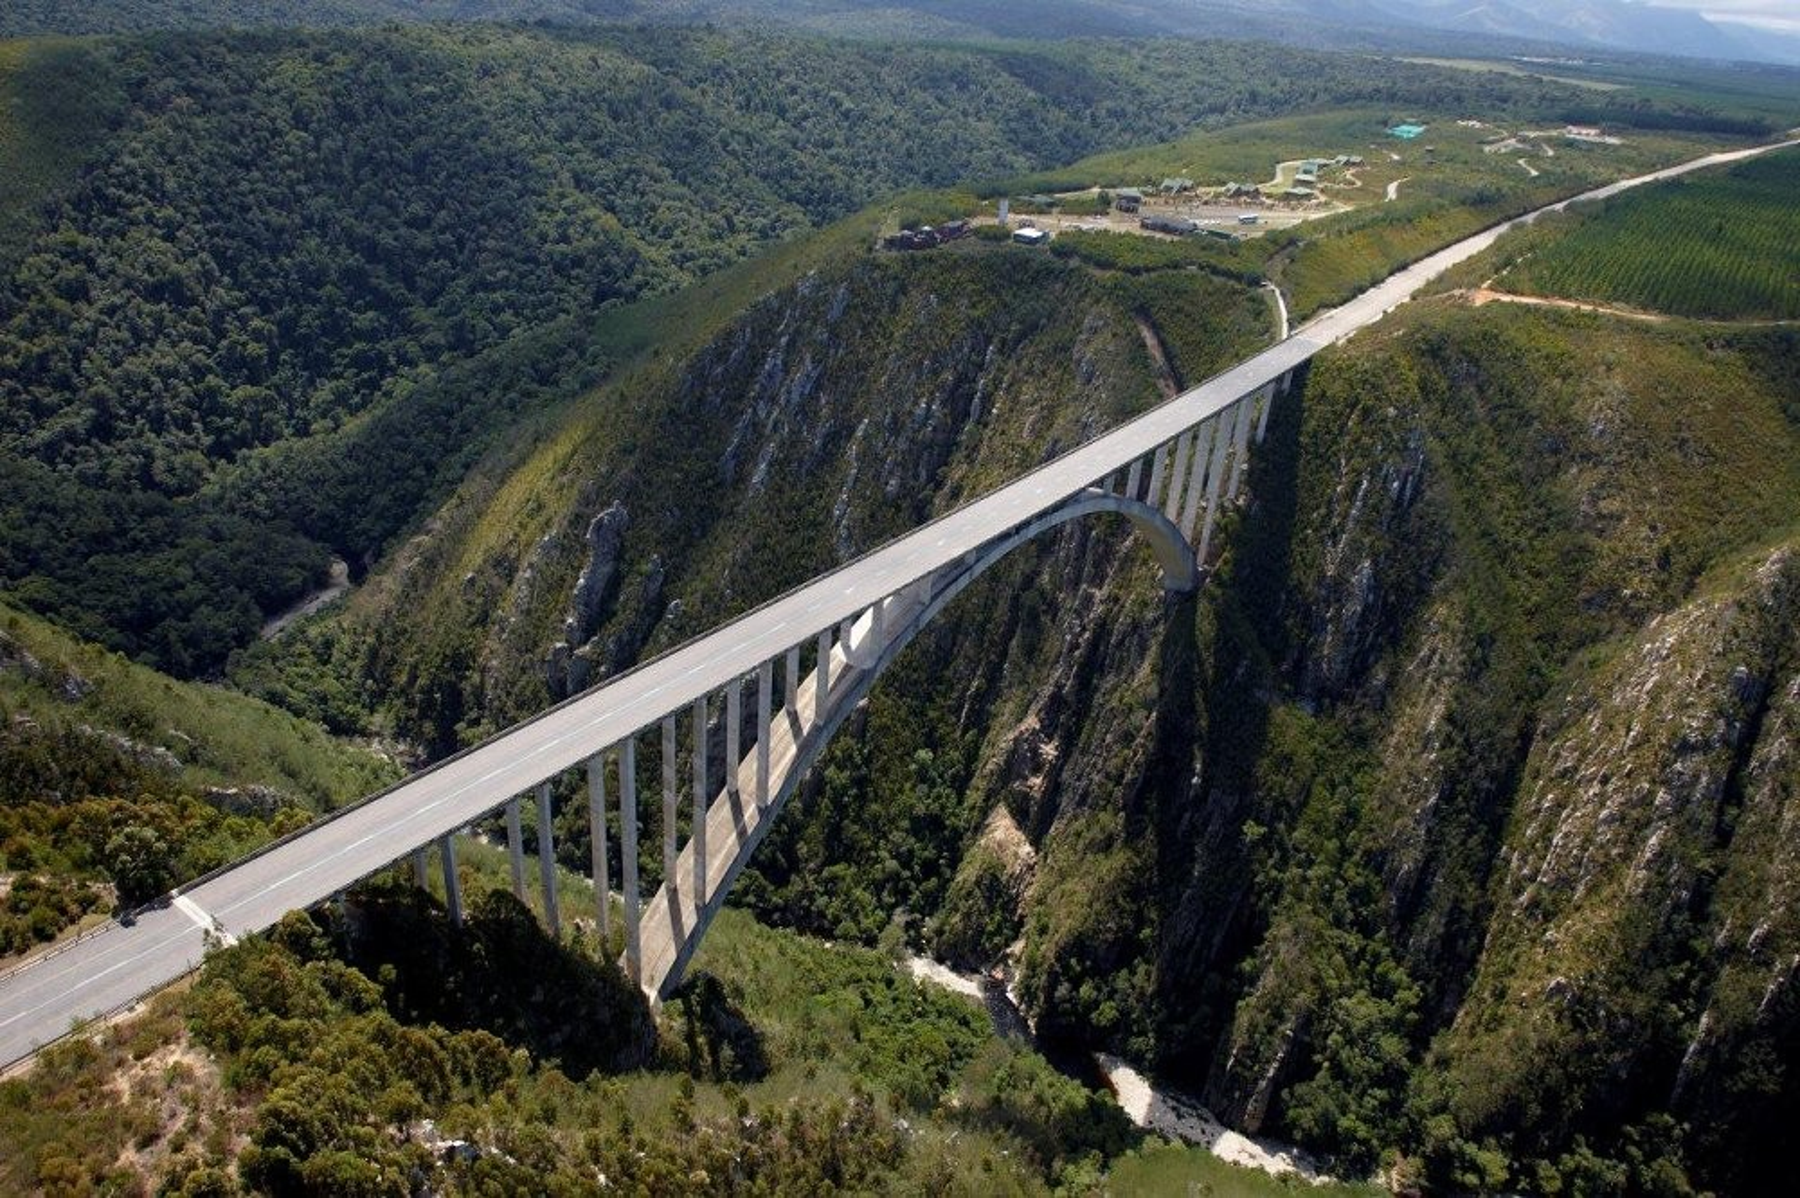 The Garden Route_Bloukrans Bridge